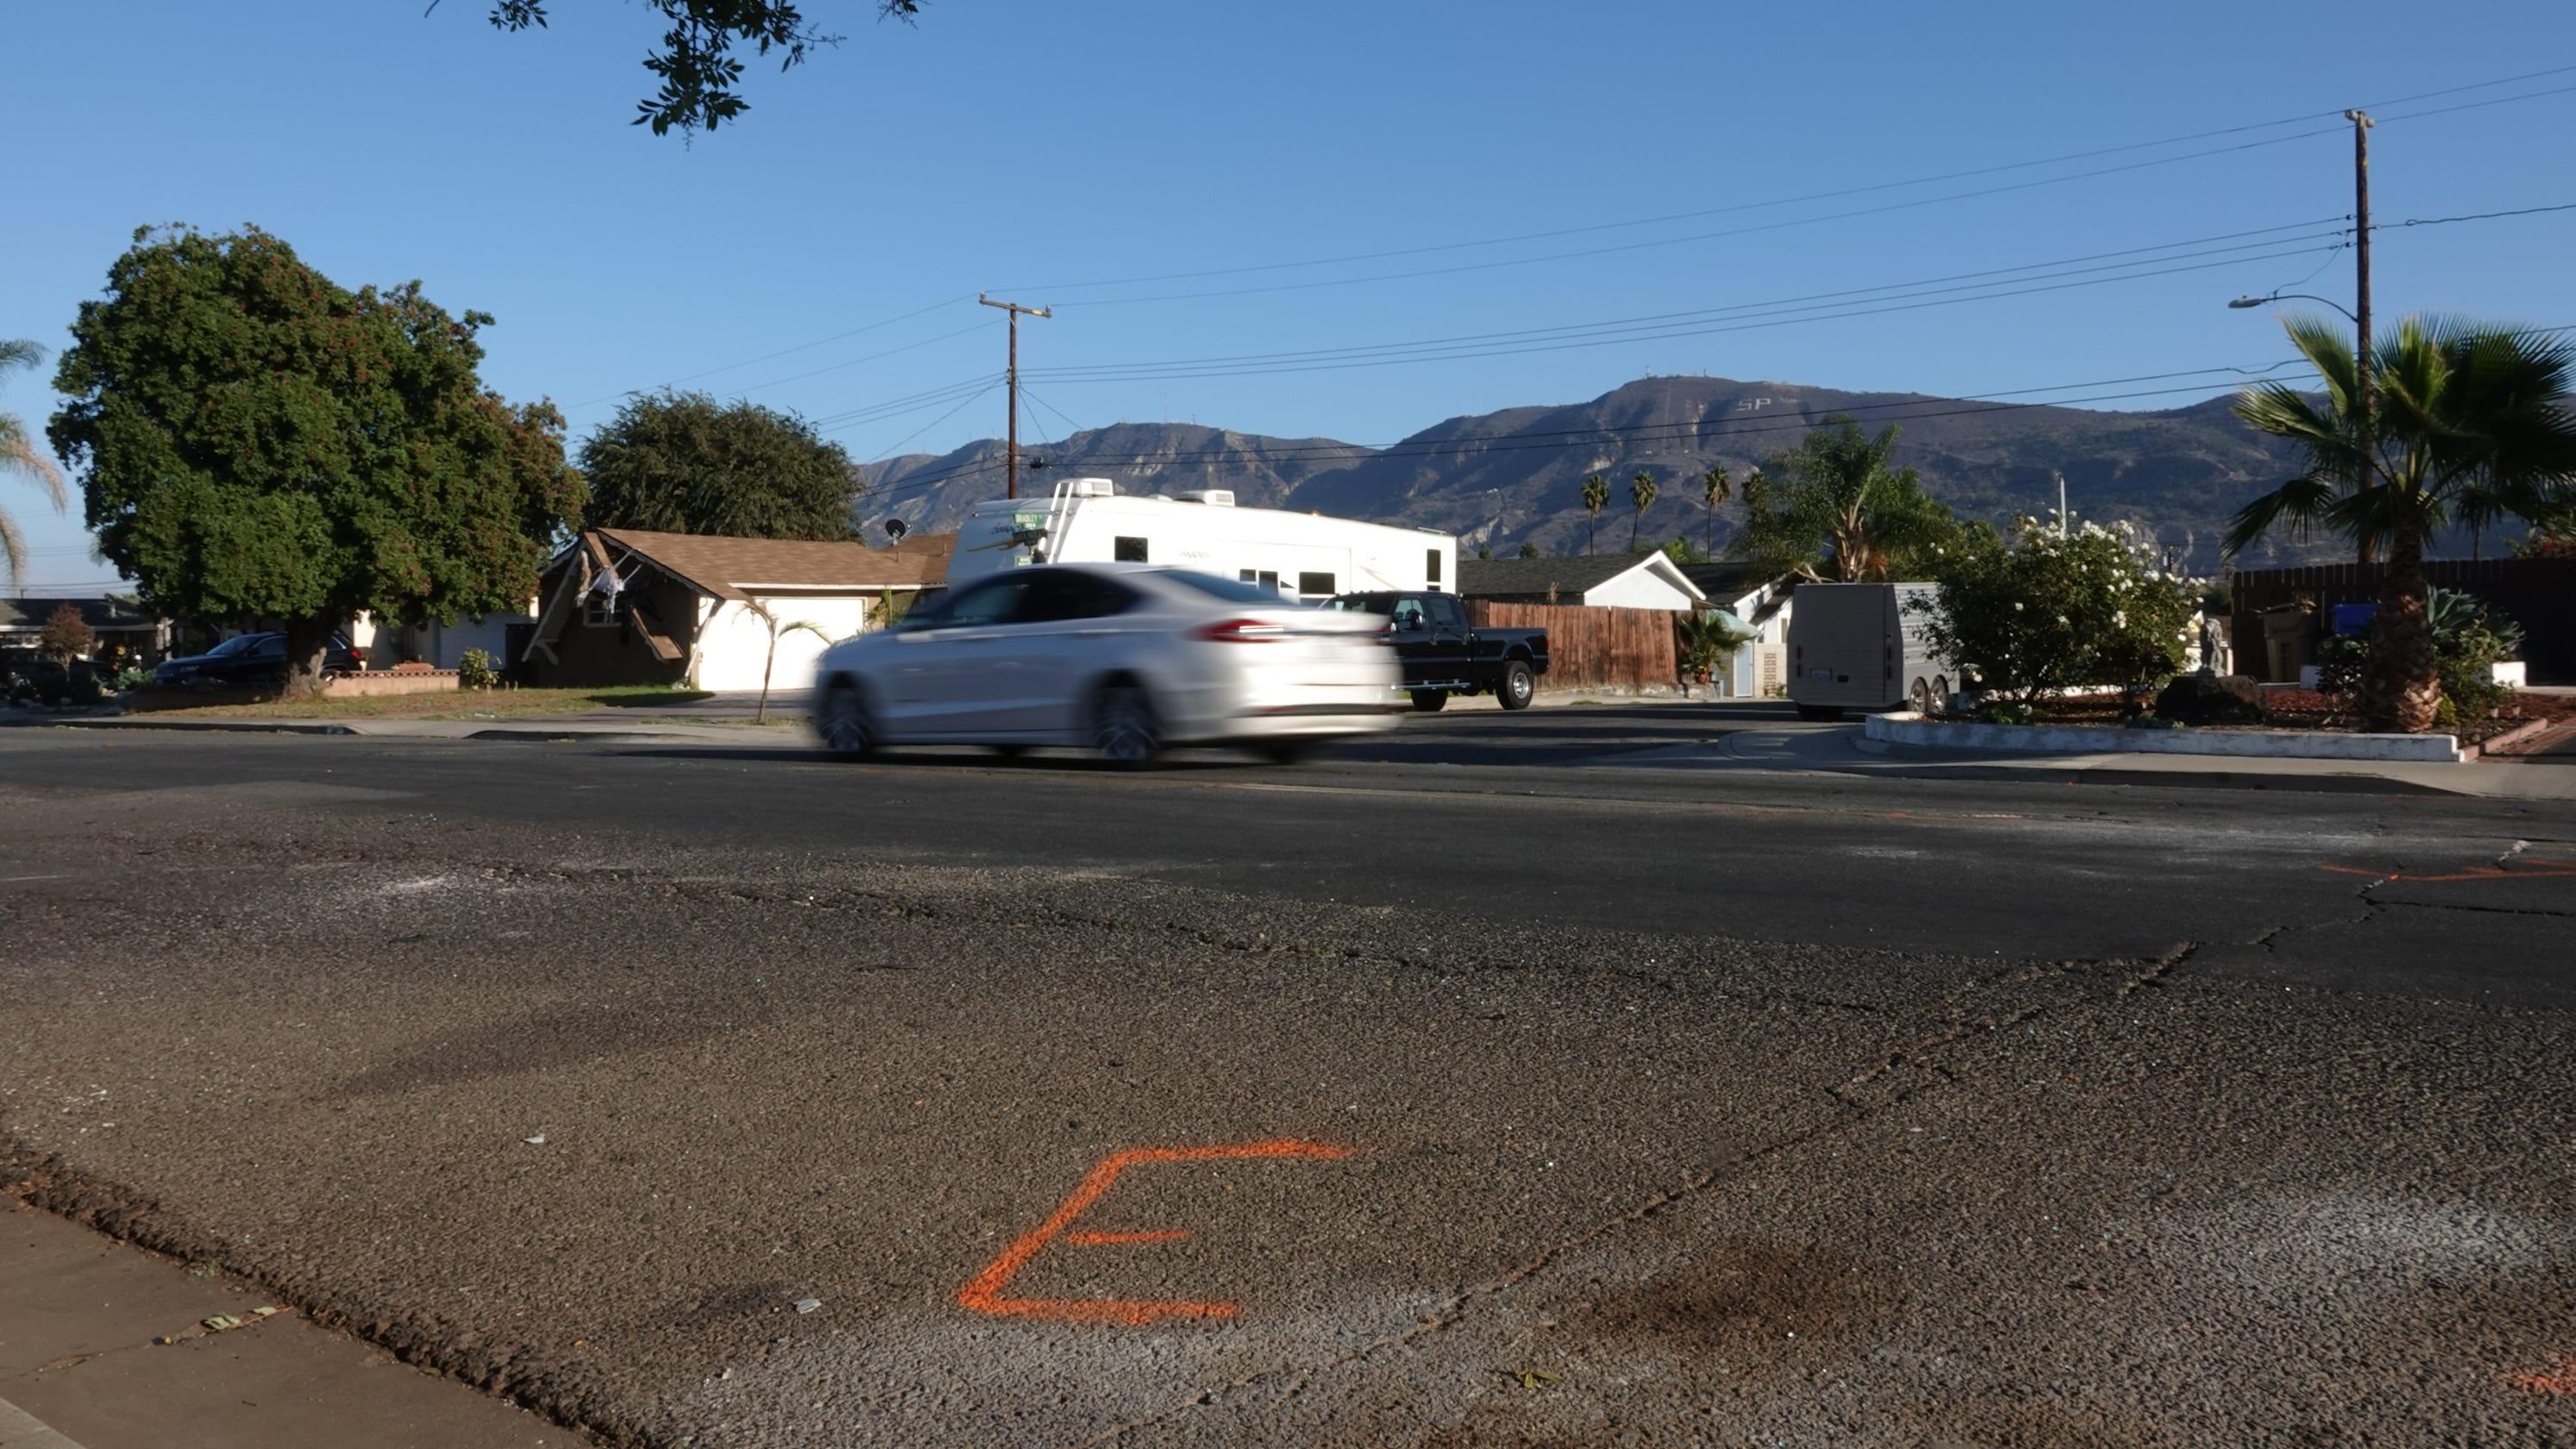 Fatal crash in Santa Paula, crashes in Thousand Oaks and